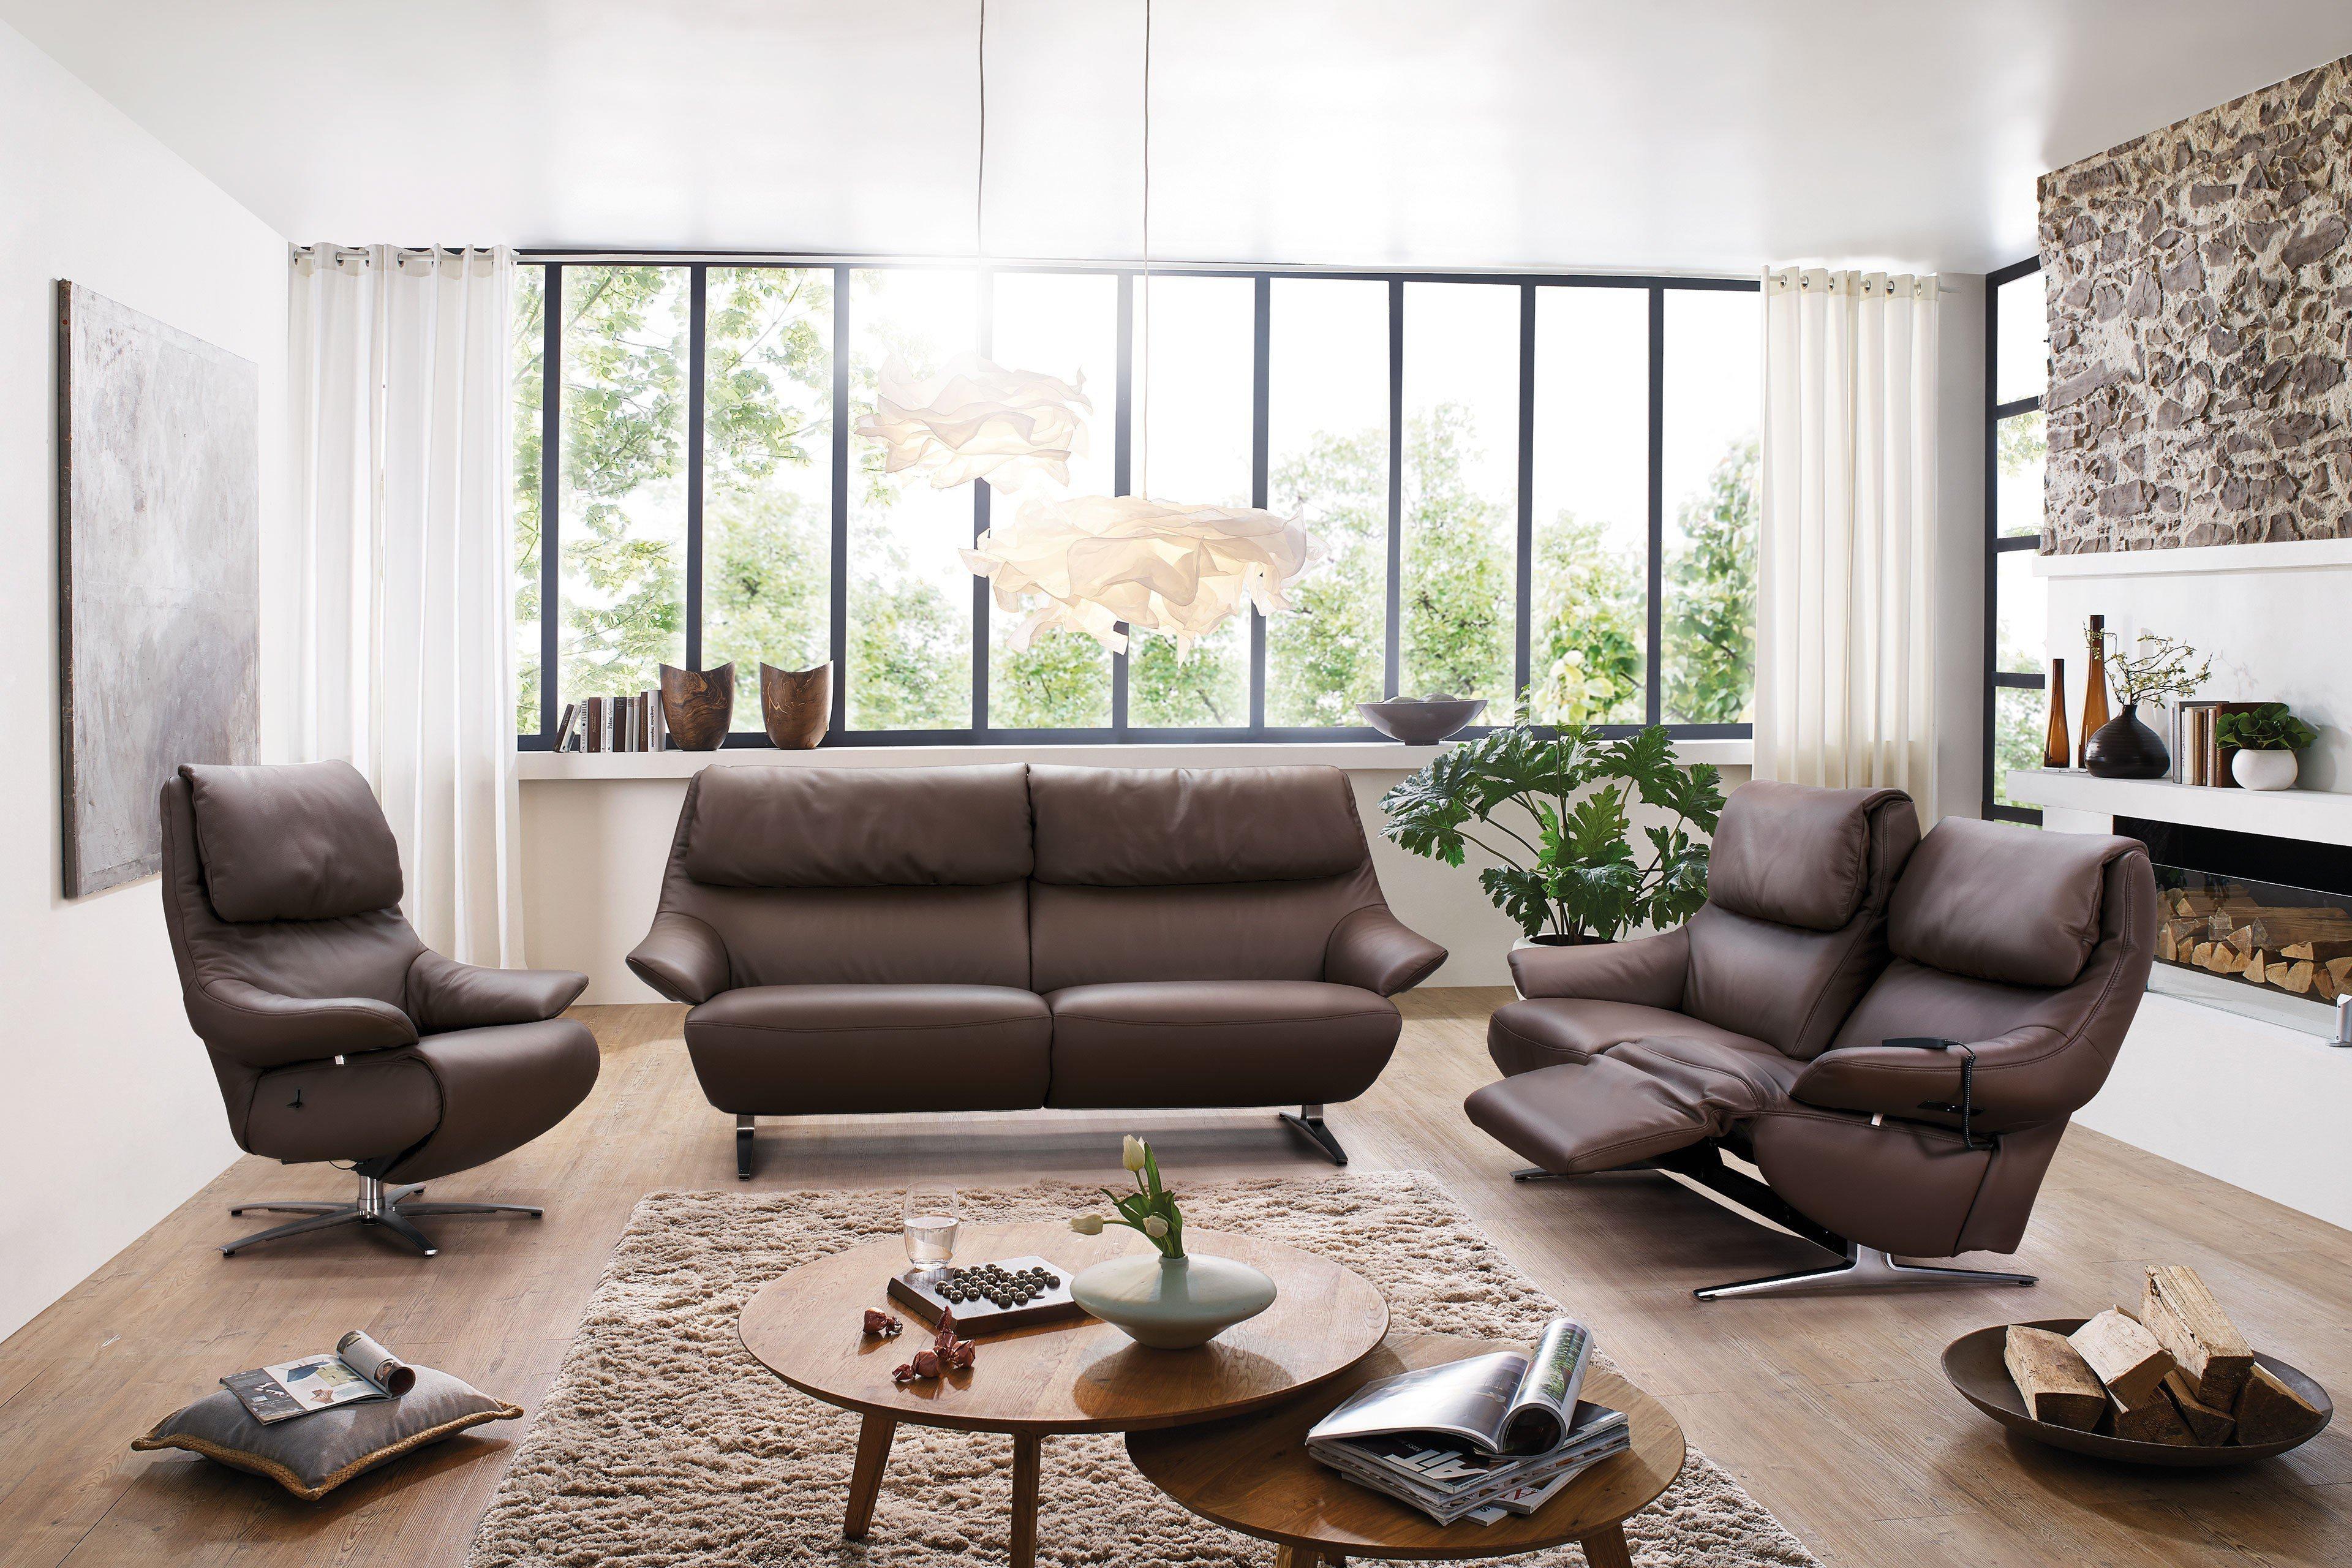 himolla polsterm bel 4602 polstergarnitur braun m bel letz ihr online shop. Black Bedroom Furniture Sets. Home Design Ideas